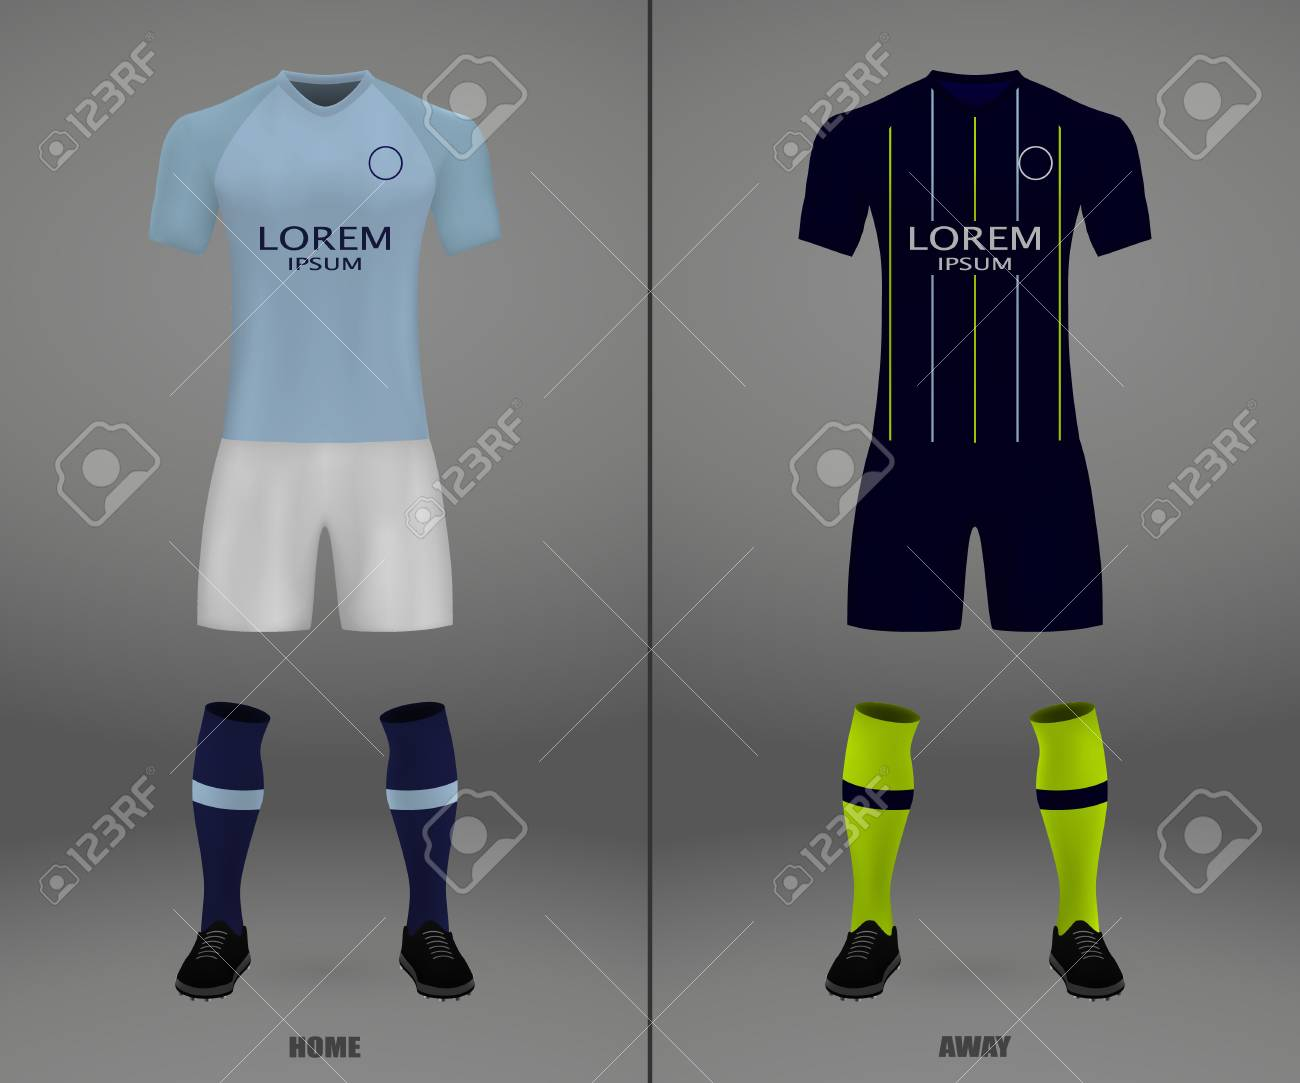 best service 10104 0c72a football kit Manchester City 2018-19, shirt template for soccer..